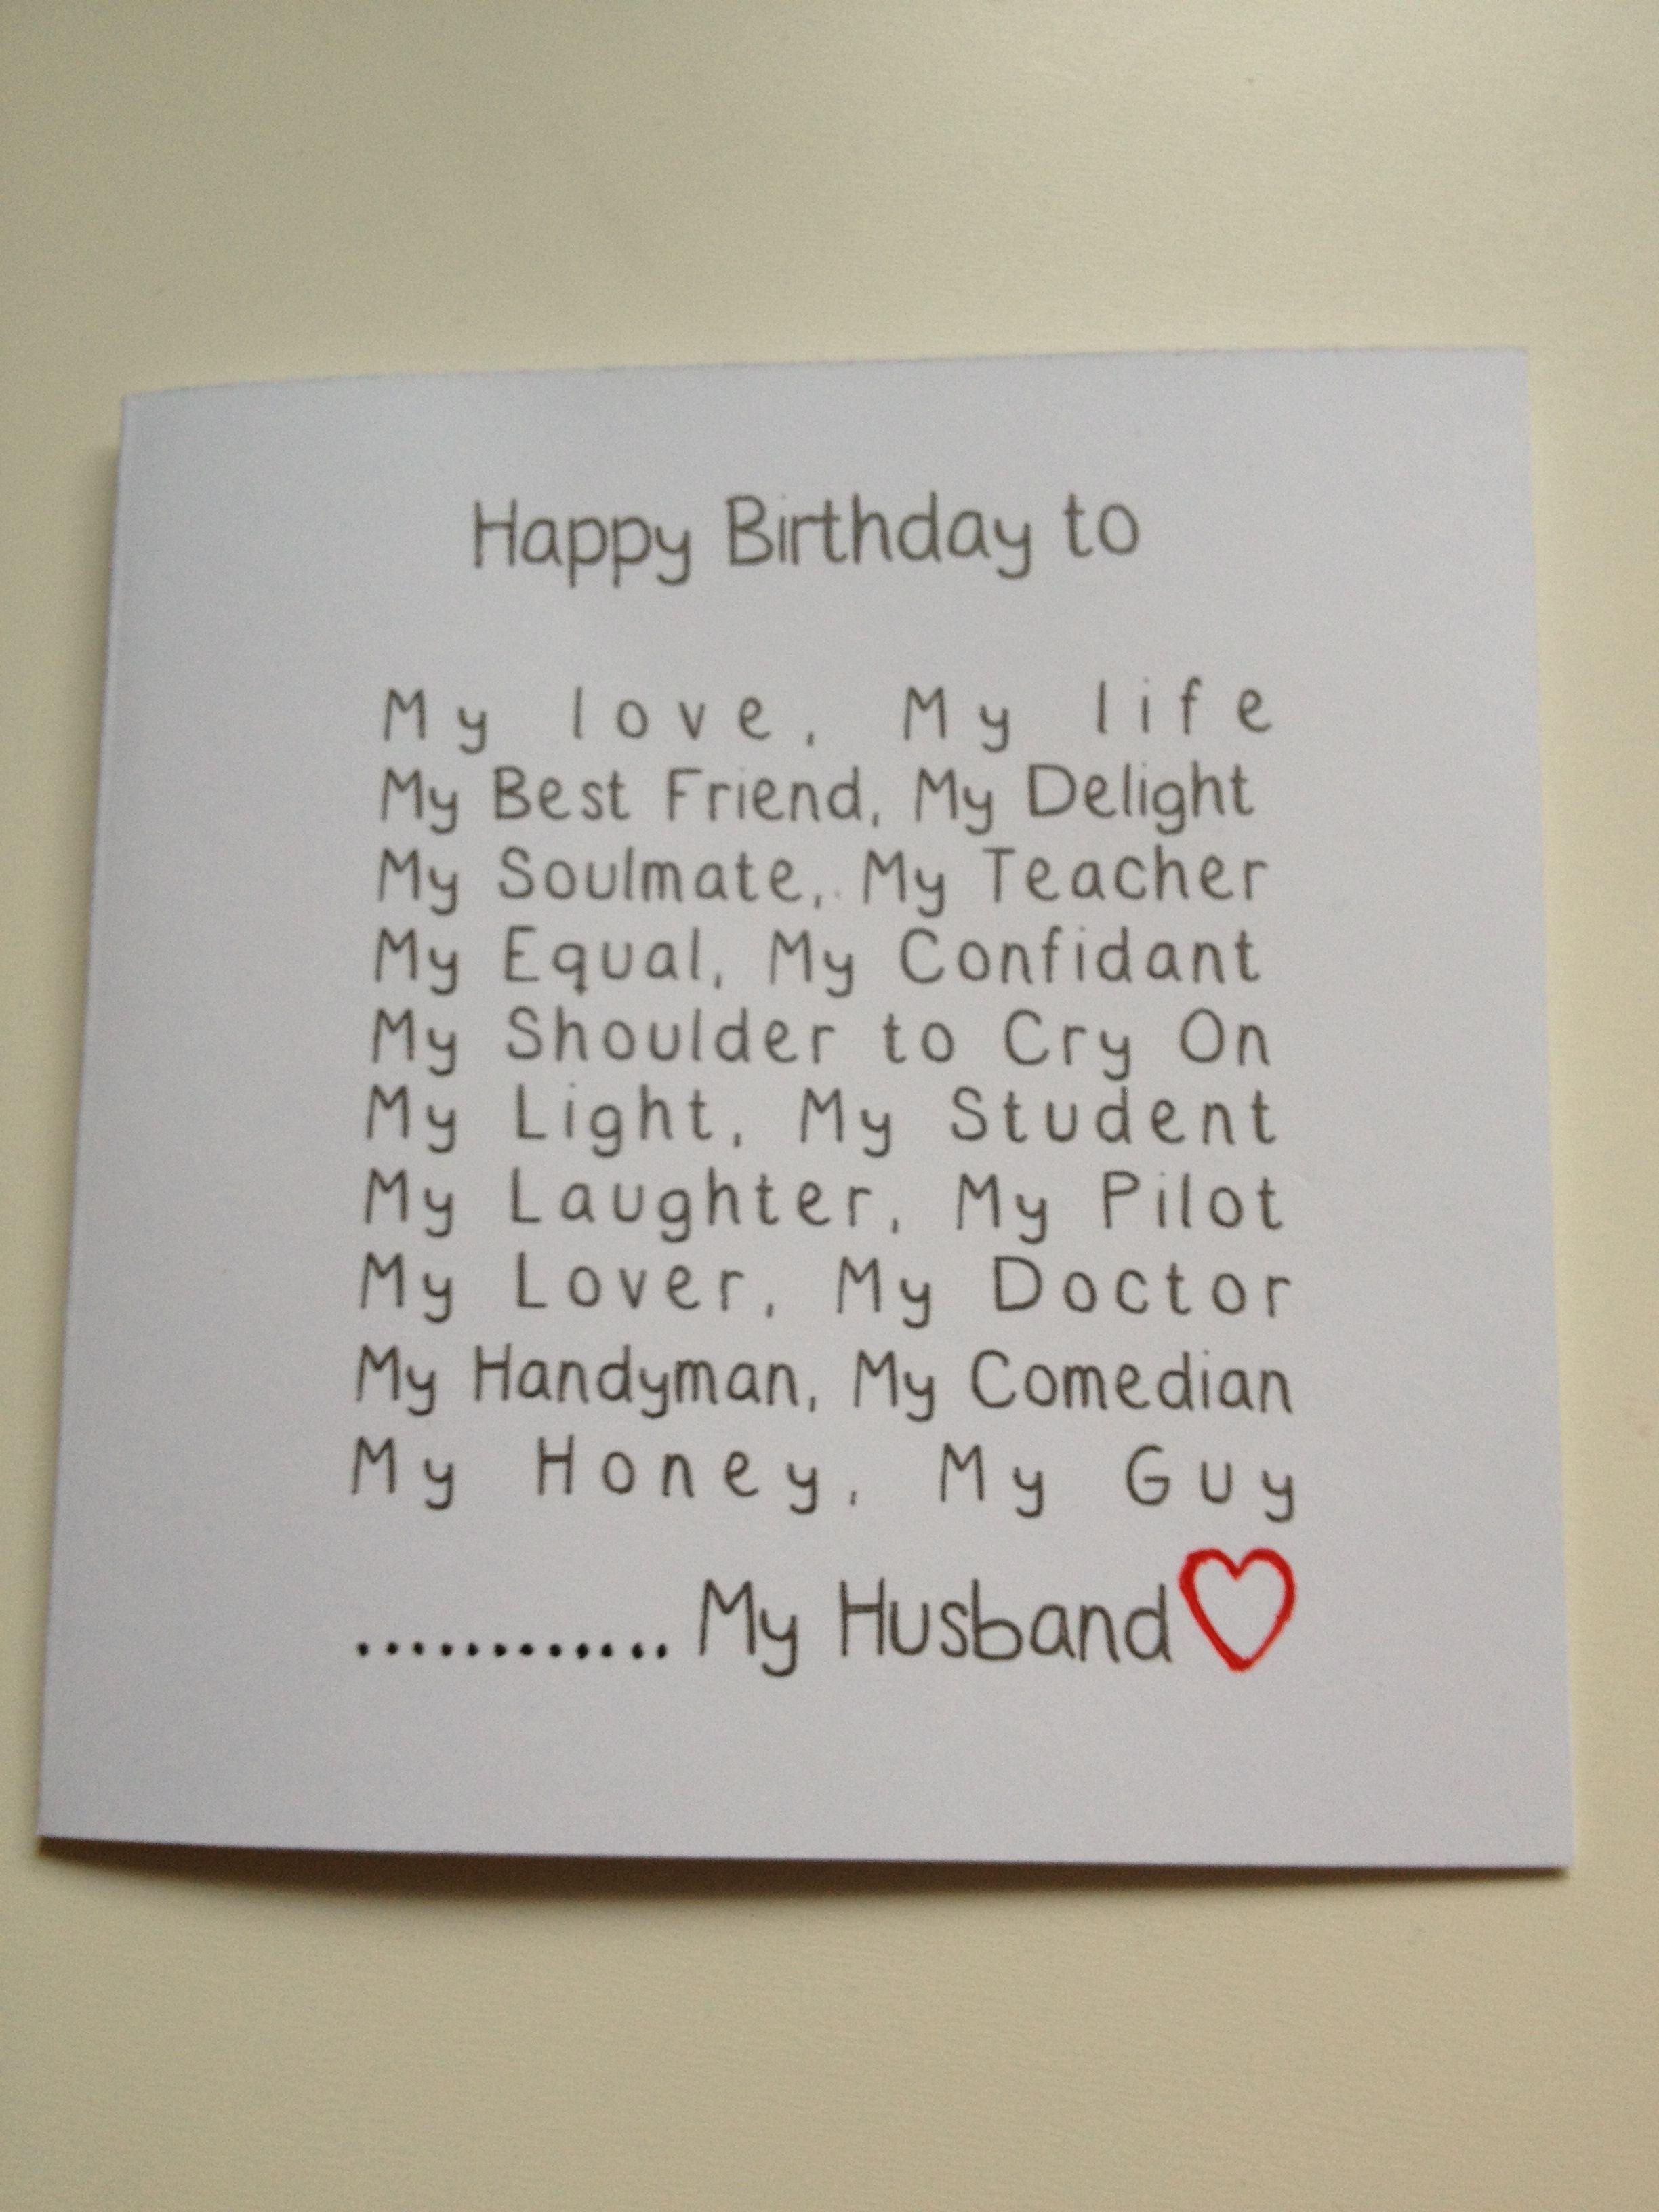 Handmade Husband Birthday Card Funny Adam My Love Pinterest Birthdays Cards And Card